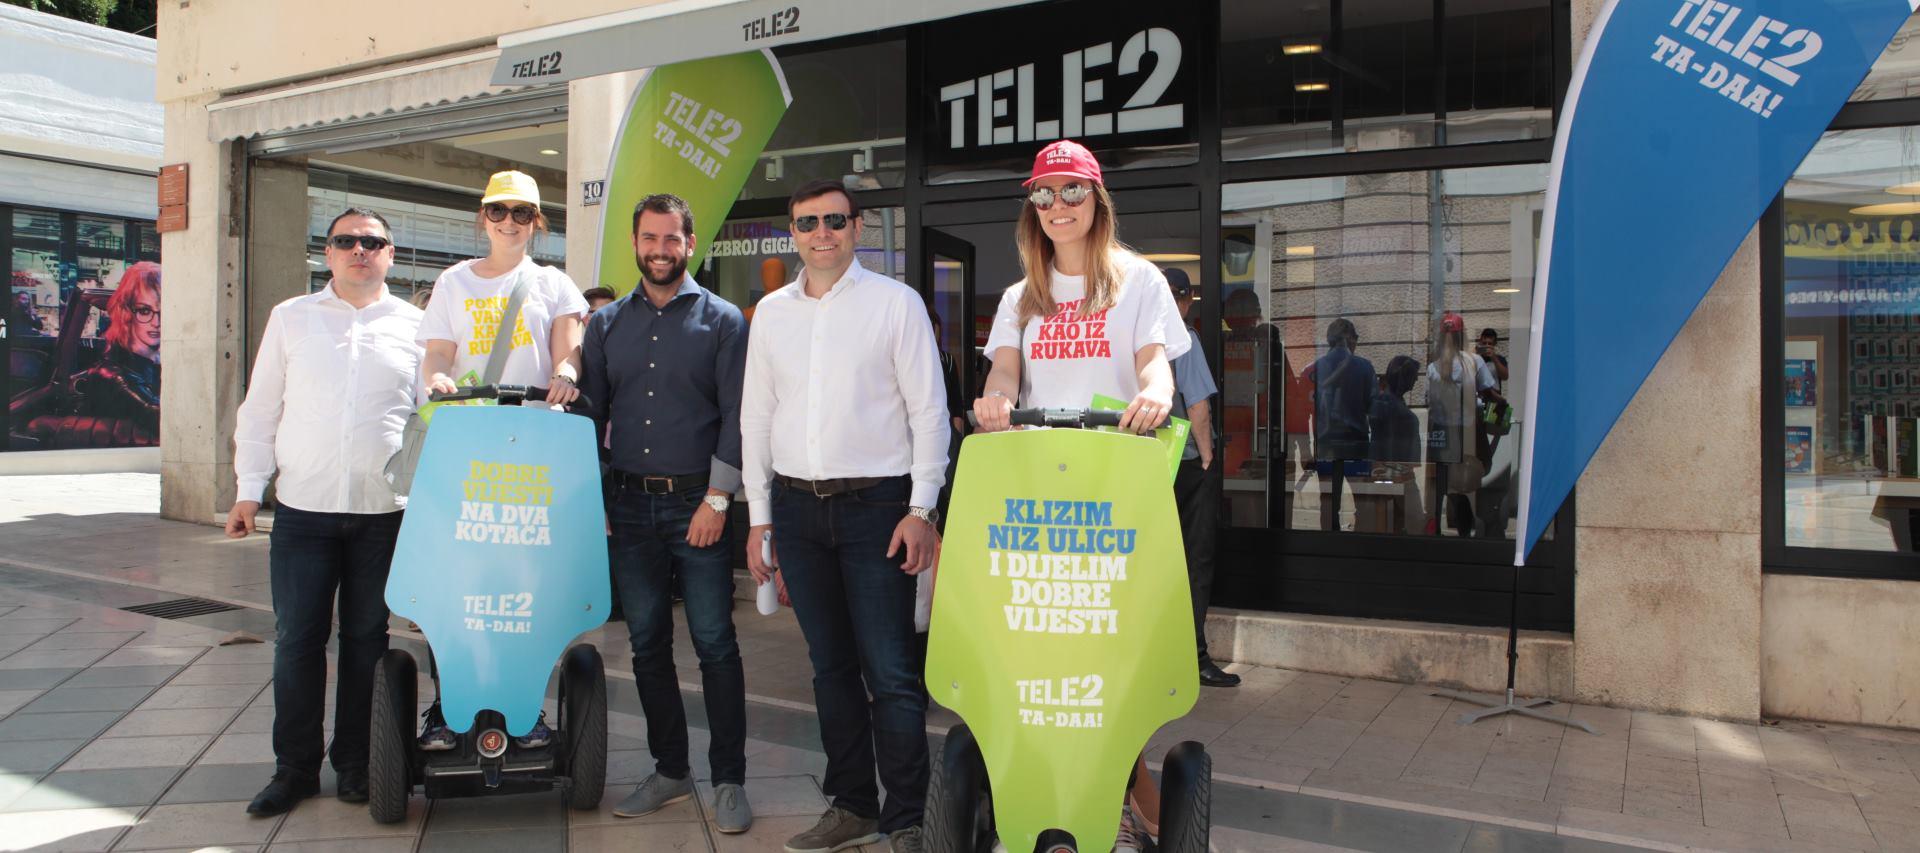 FOTO: Tele2 otvorio prvi experience centar u Gradu Splitu